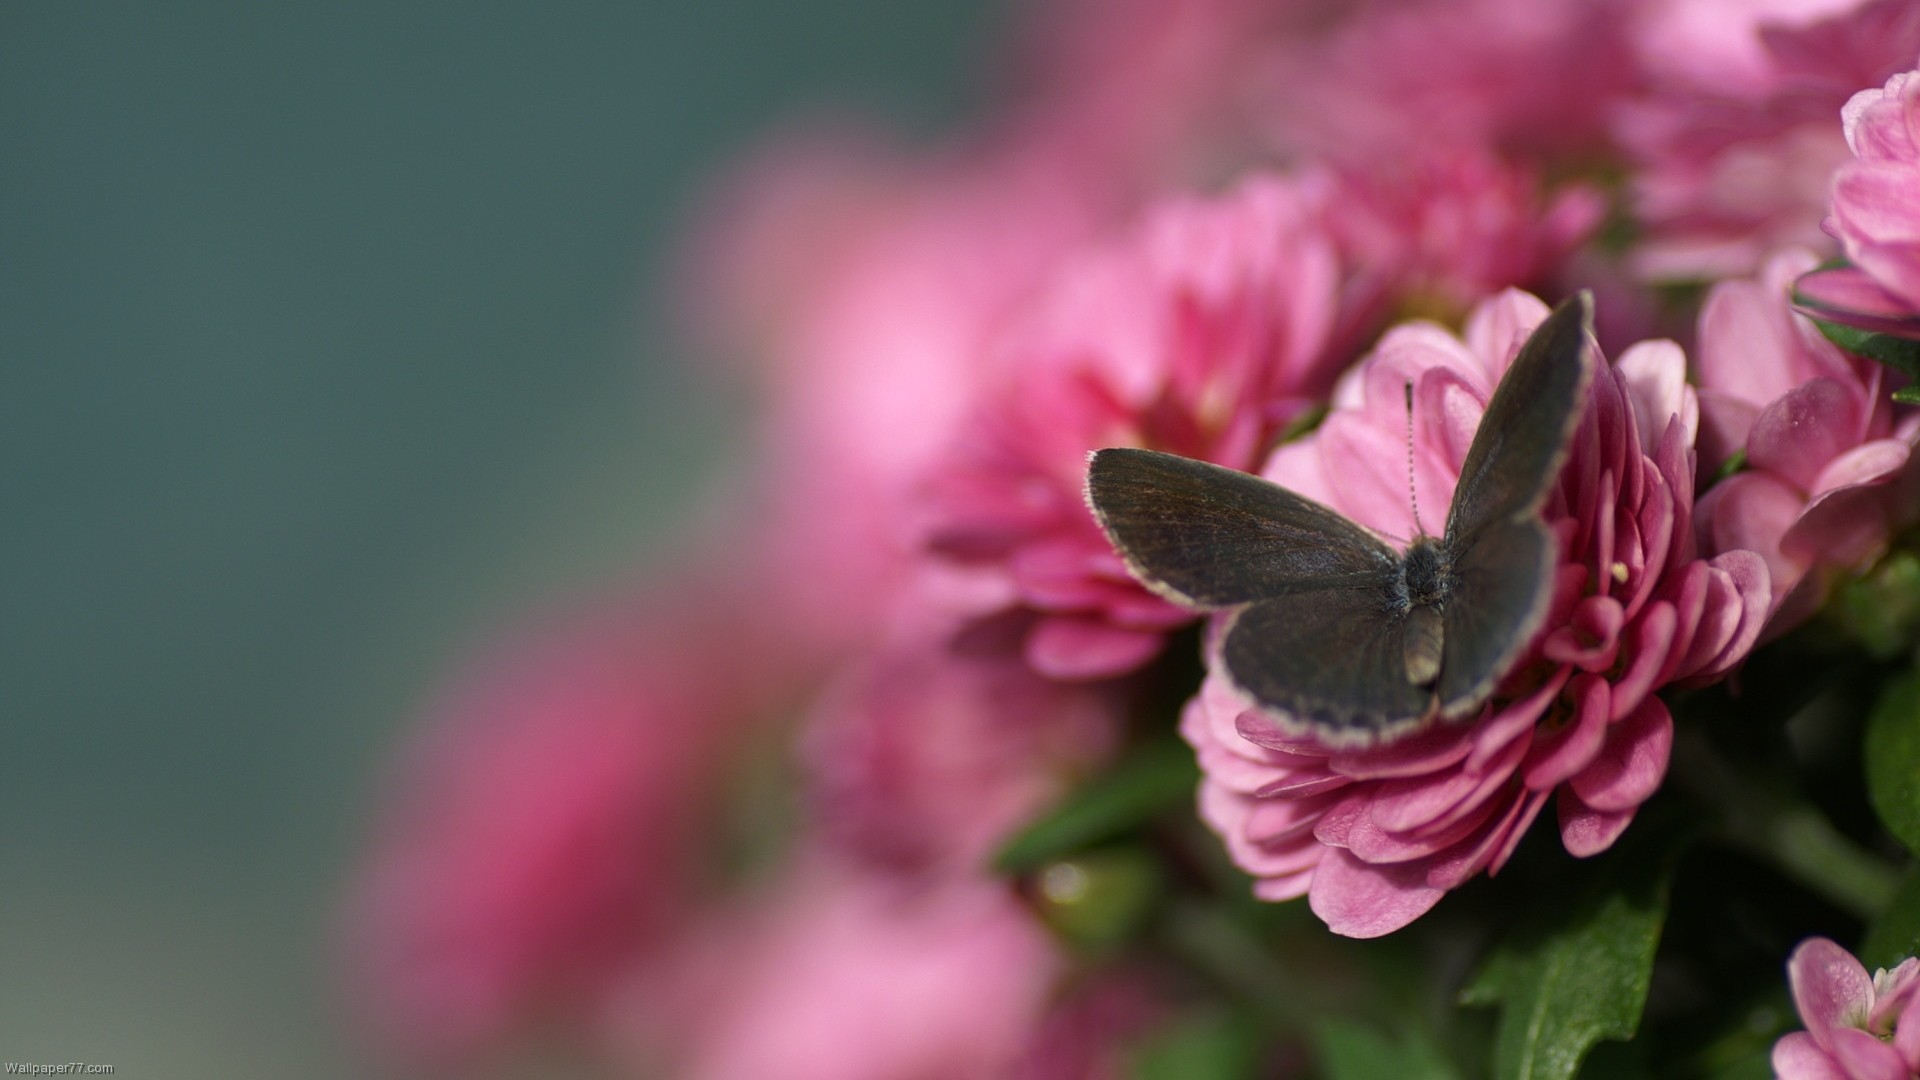 butterfly wallpaper Pink Butterfly Wallpaper 1920x1080